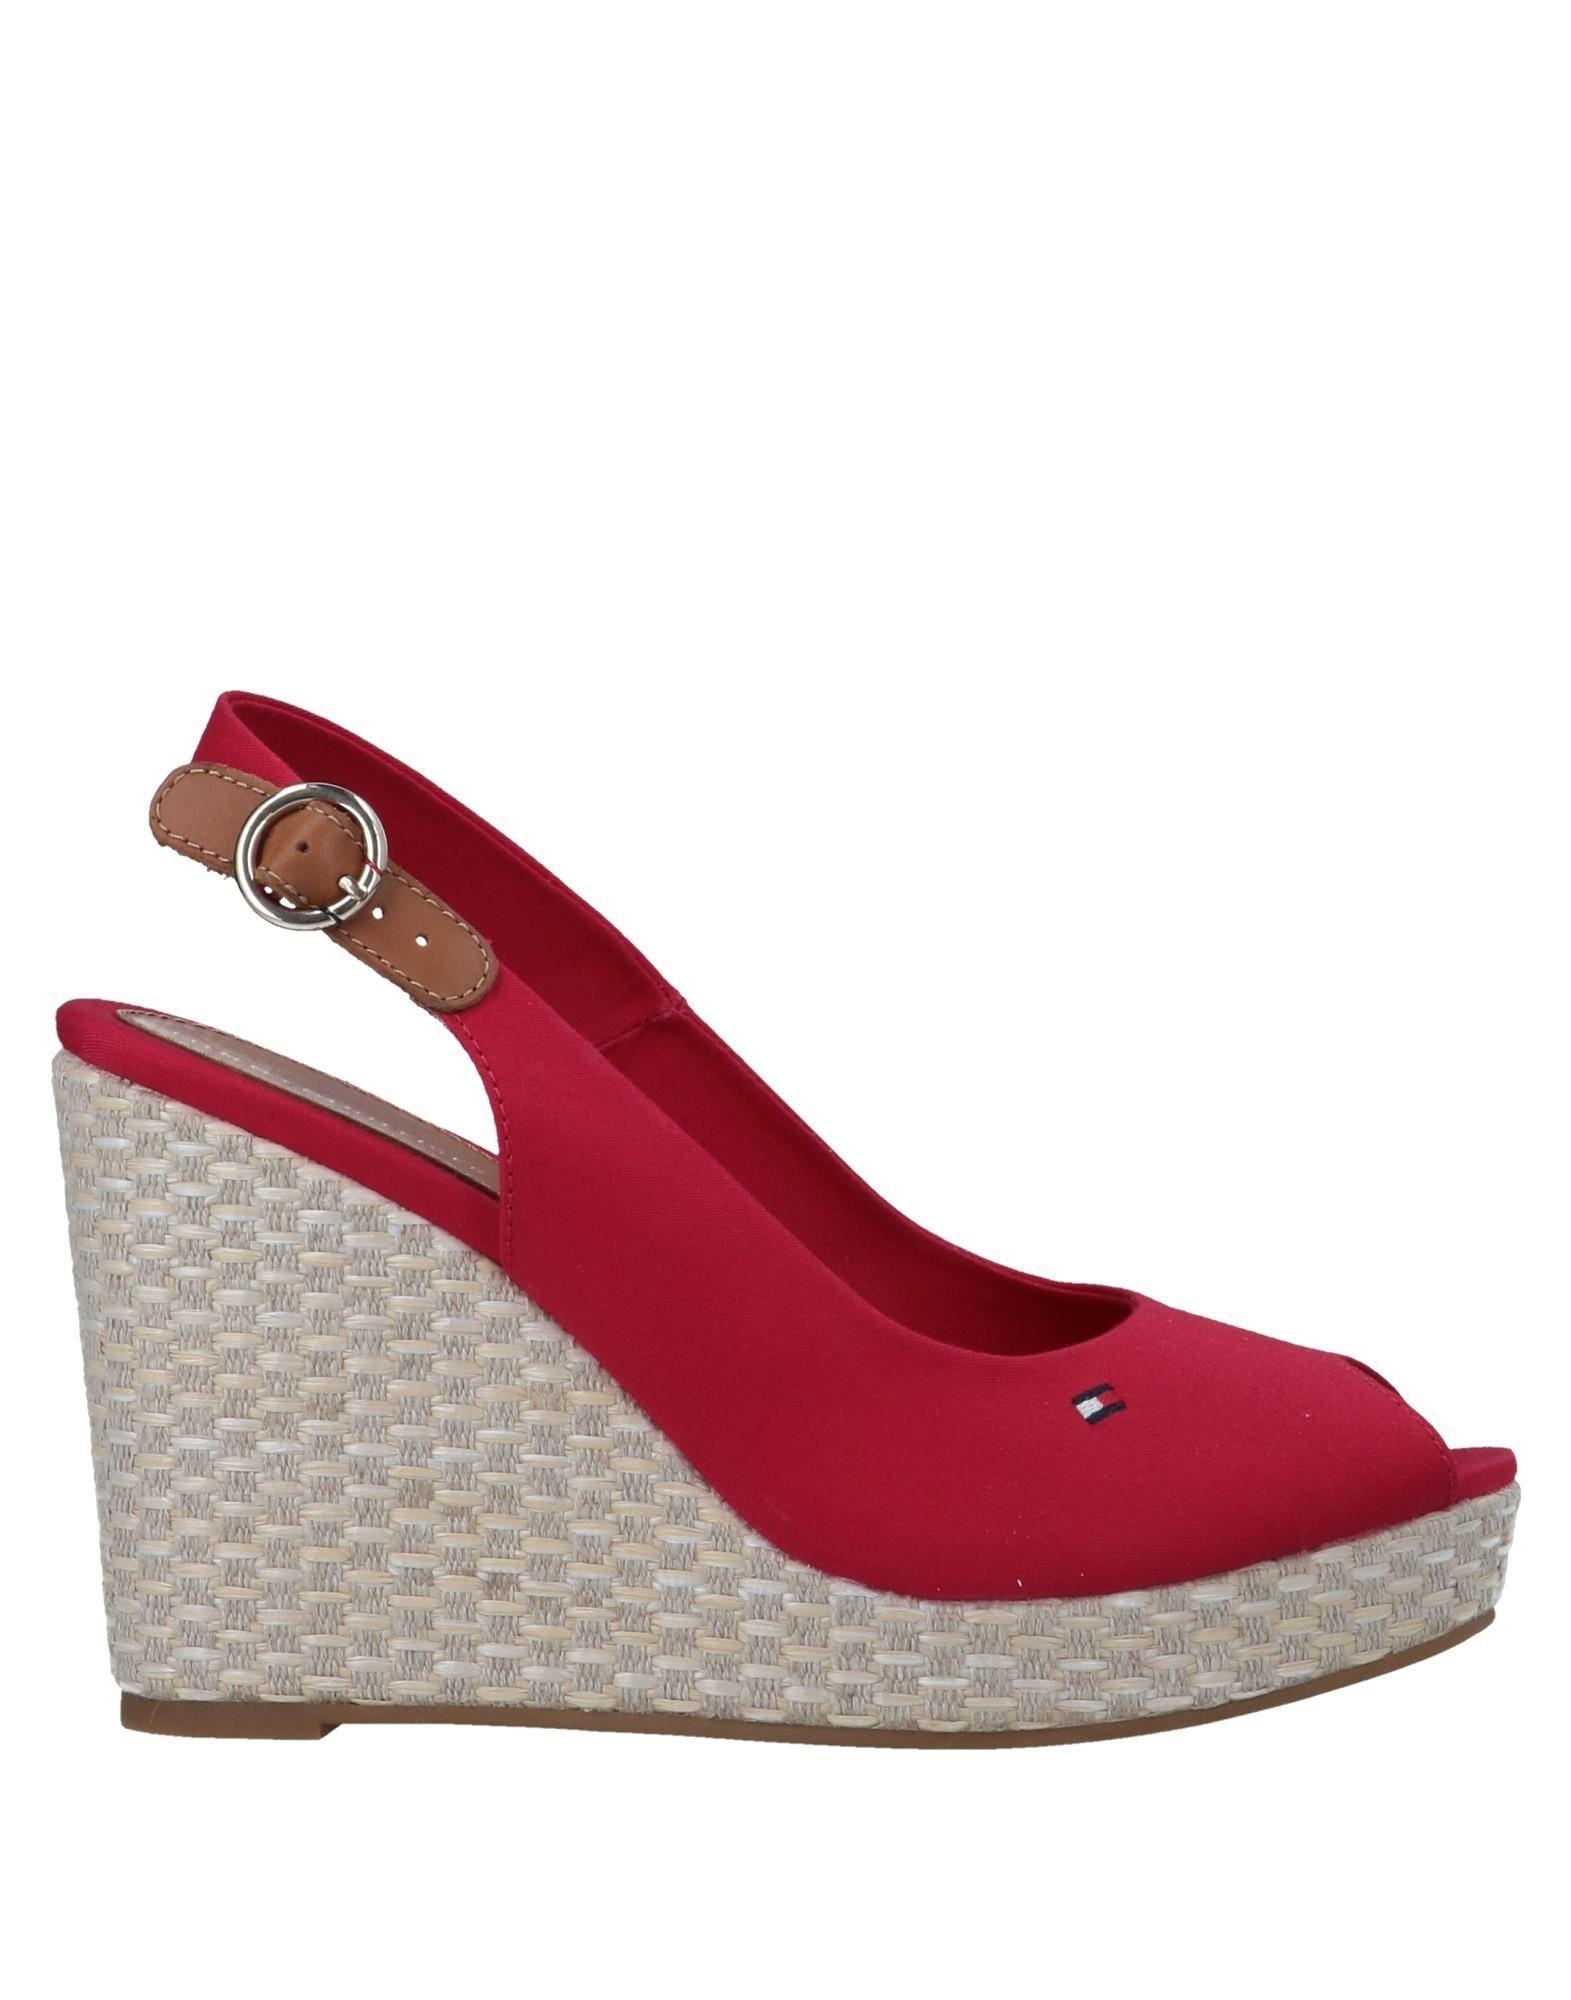 7887ab3b867b3a Lyst - Tommy Hilfiger Sandals in Red